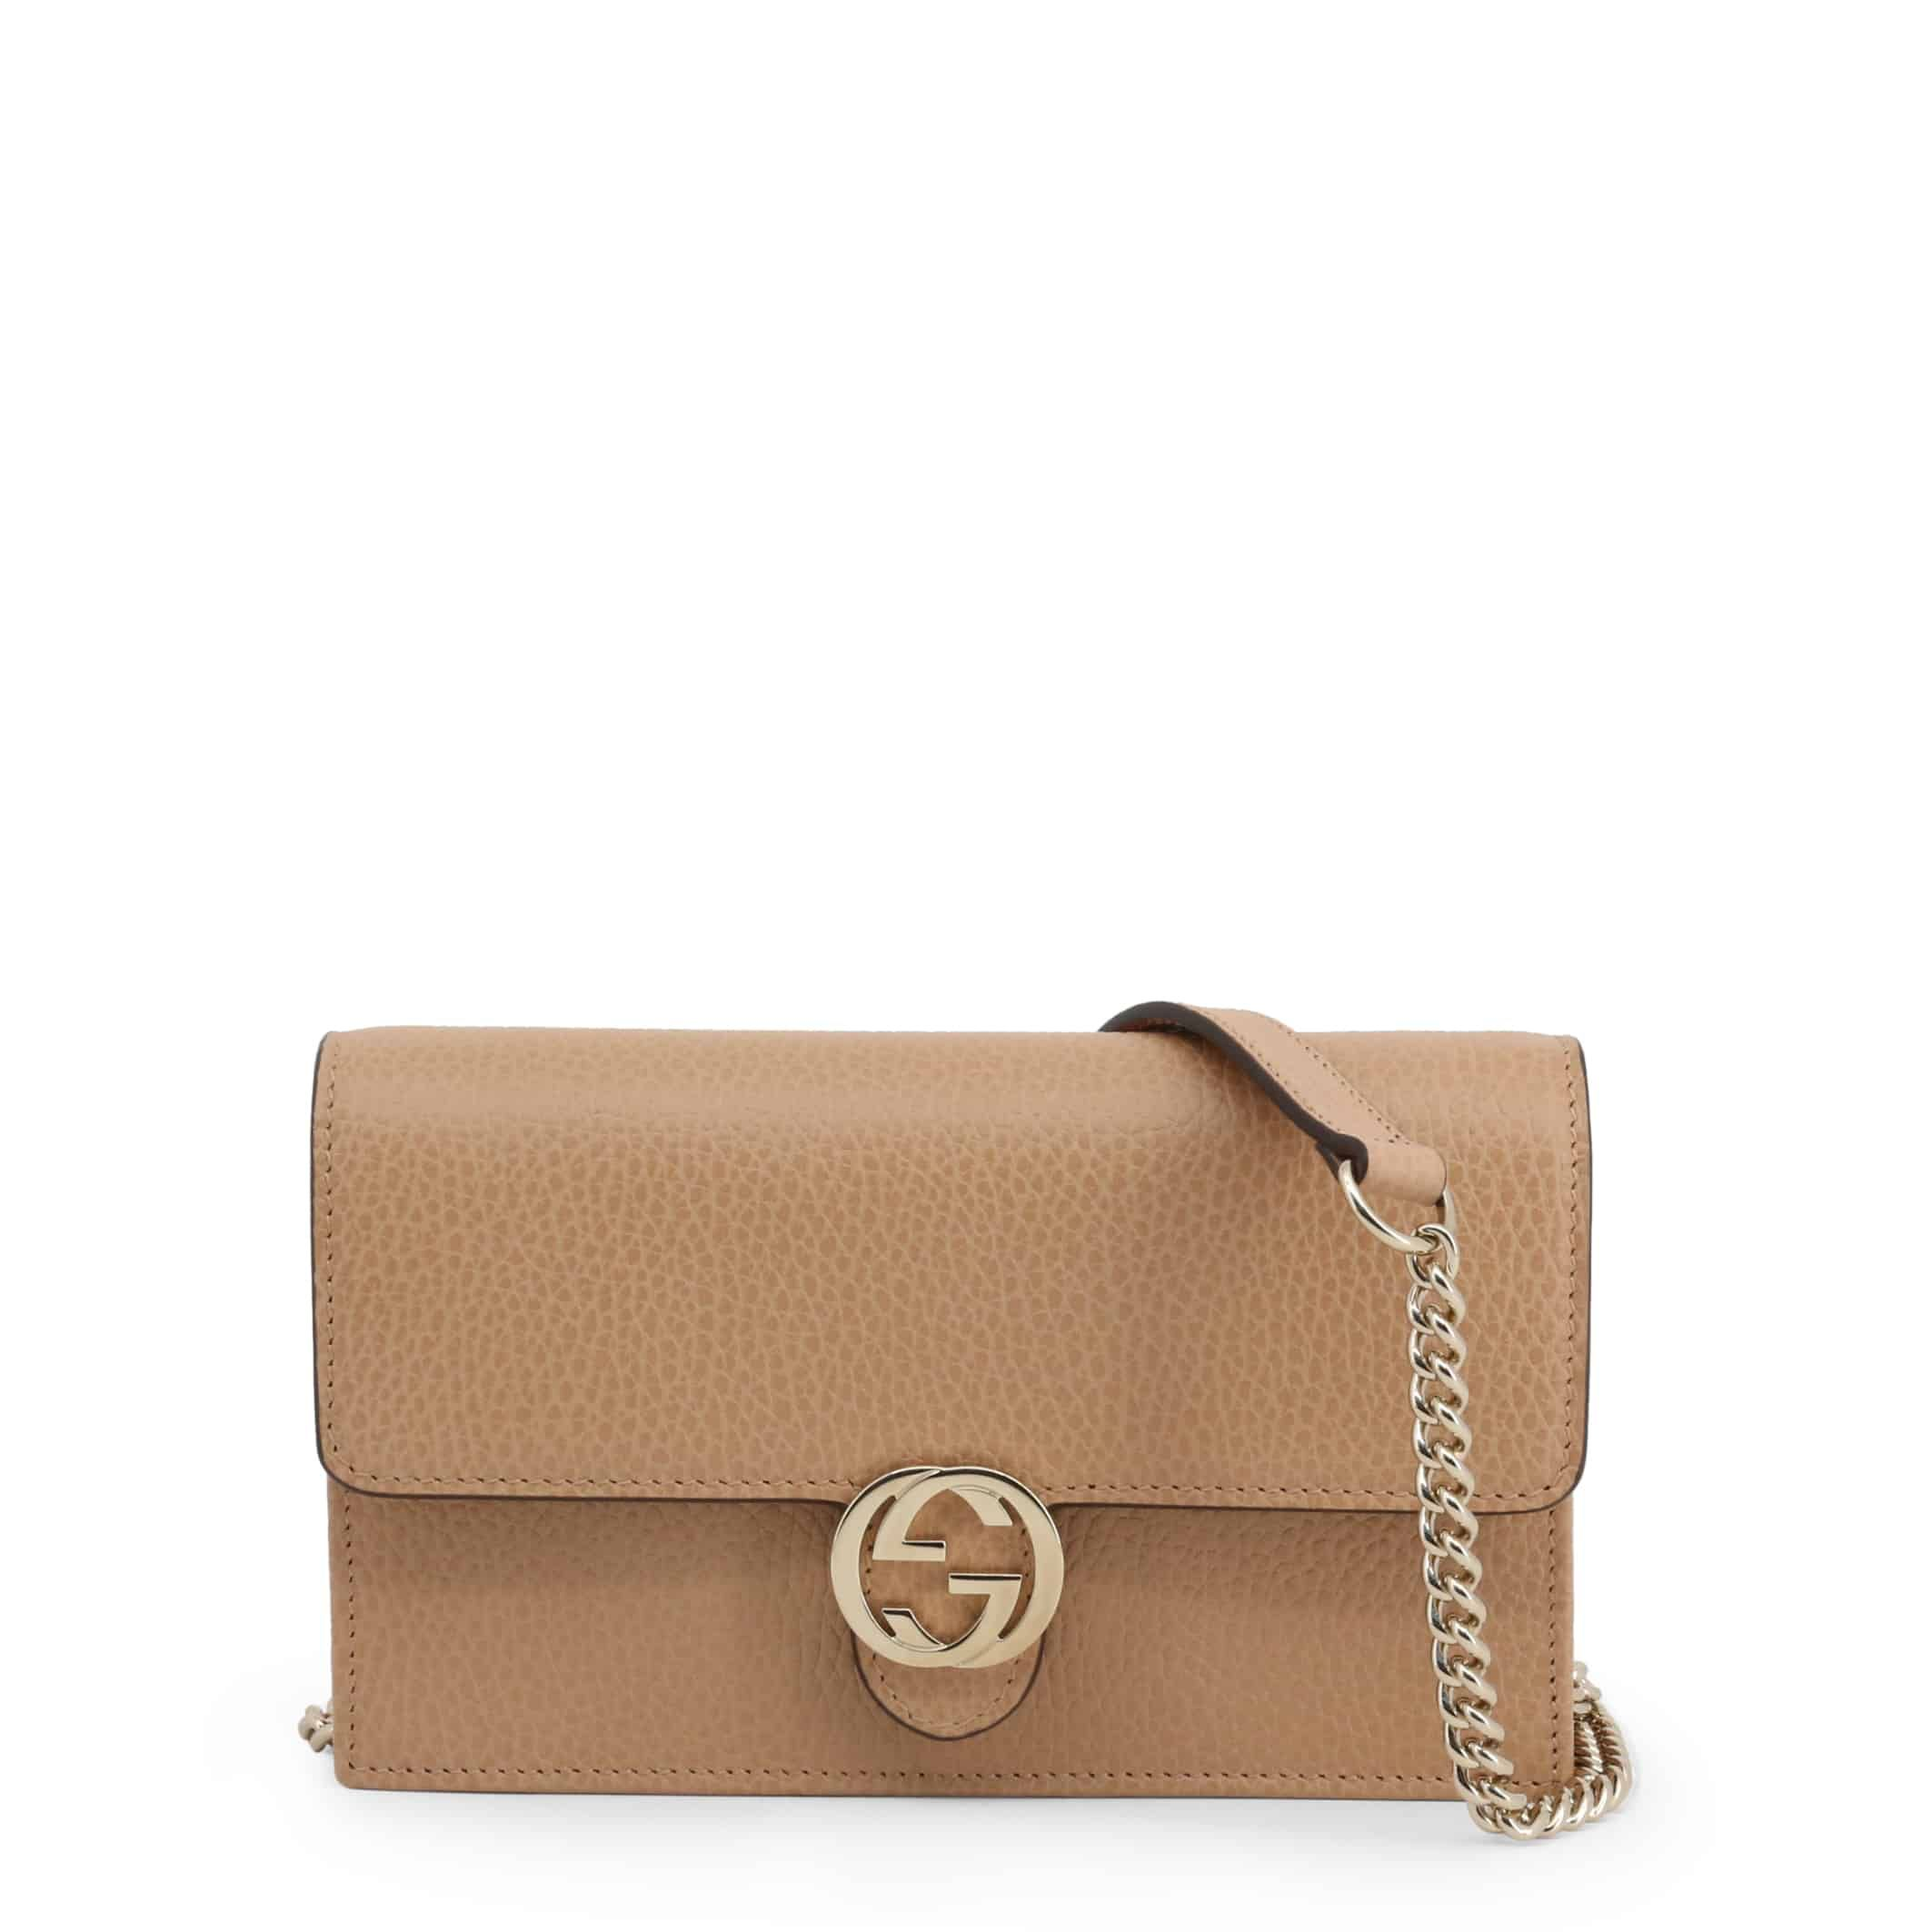 Dámská kabelka Gucci GG Wallet on Chain